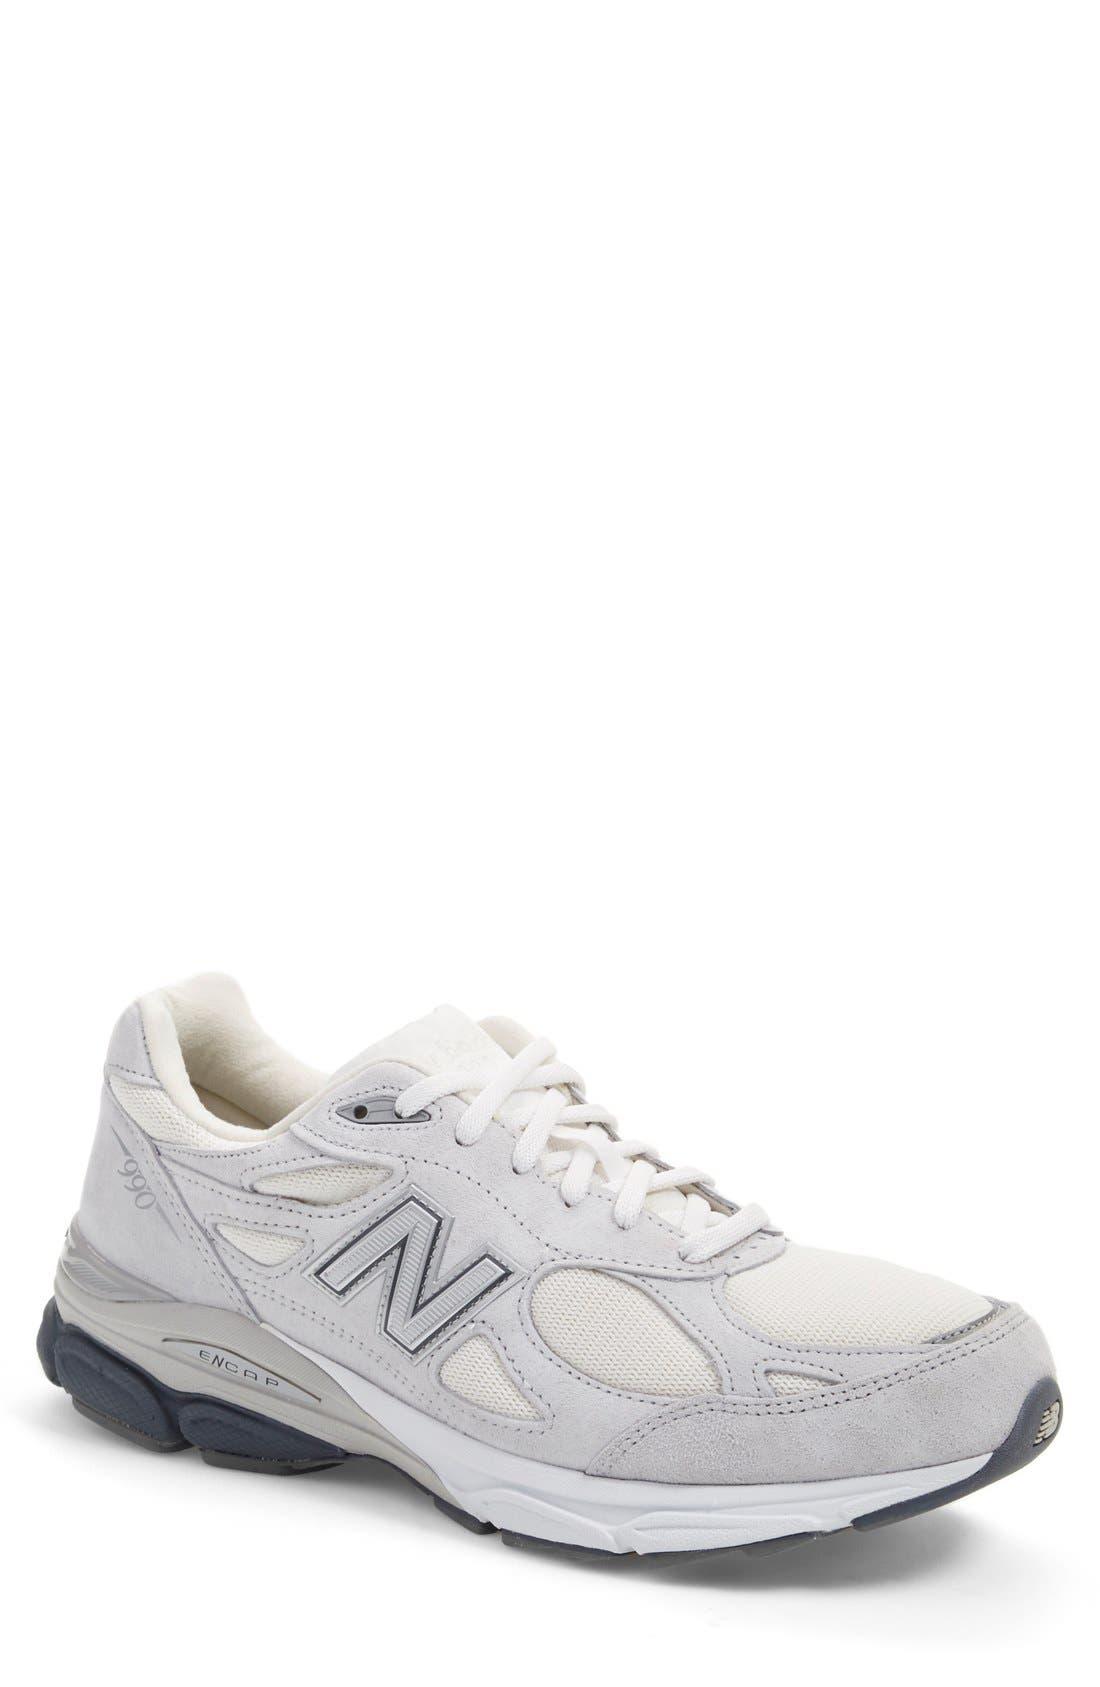 '990v3' Running Shoe, Main, color, 020